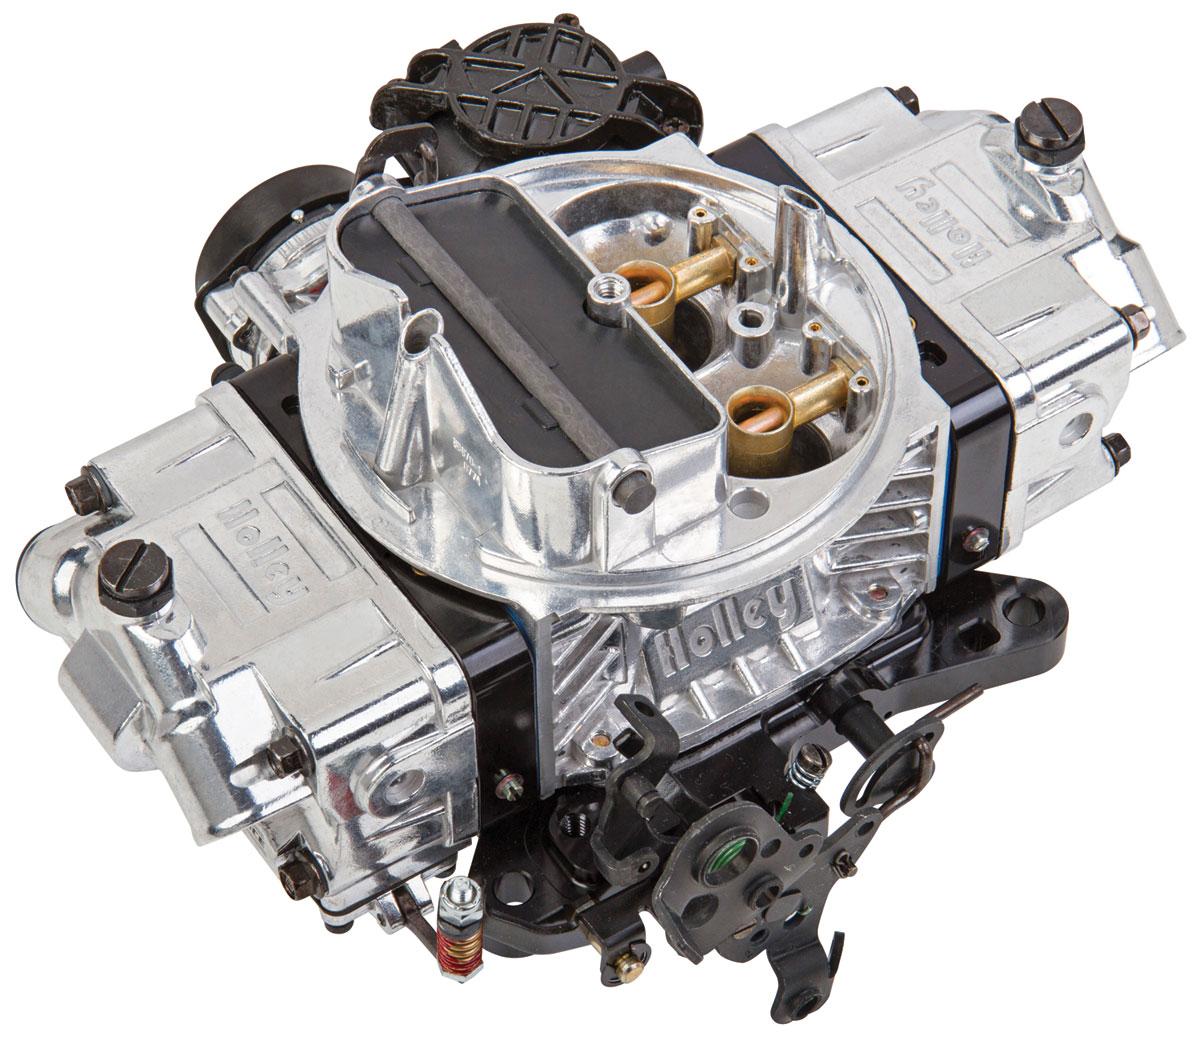 Carburetor, Holley, 770 CFM Ultra Street Avenger, Black Metering Blocks